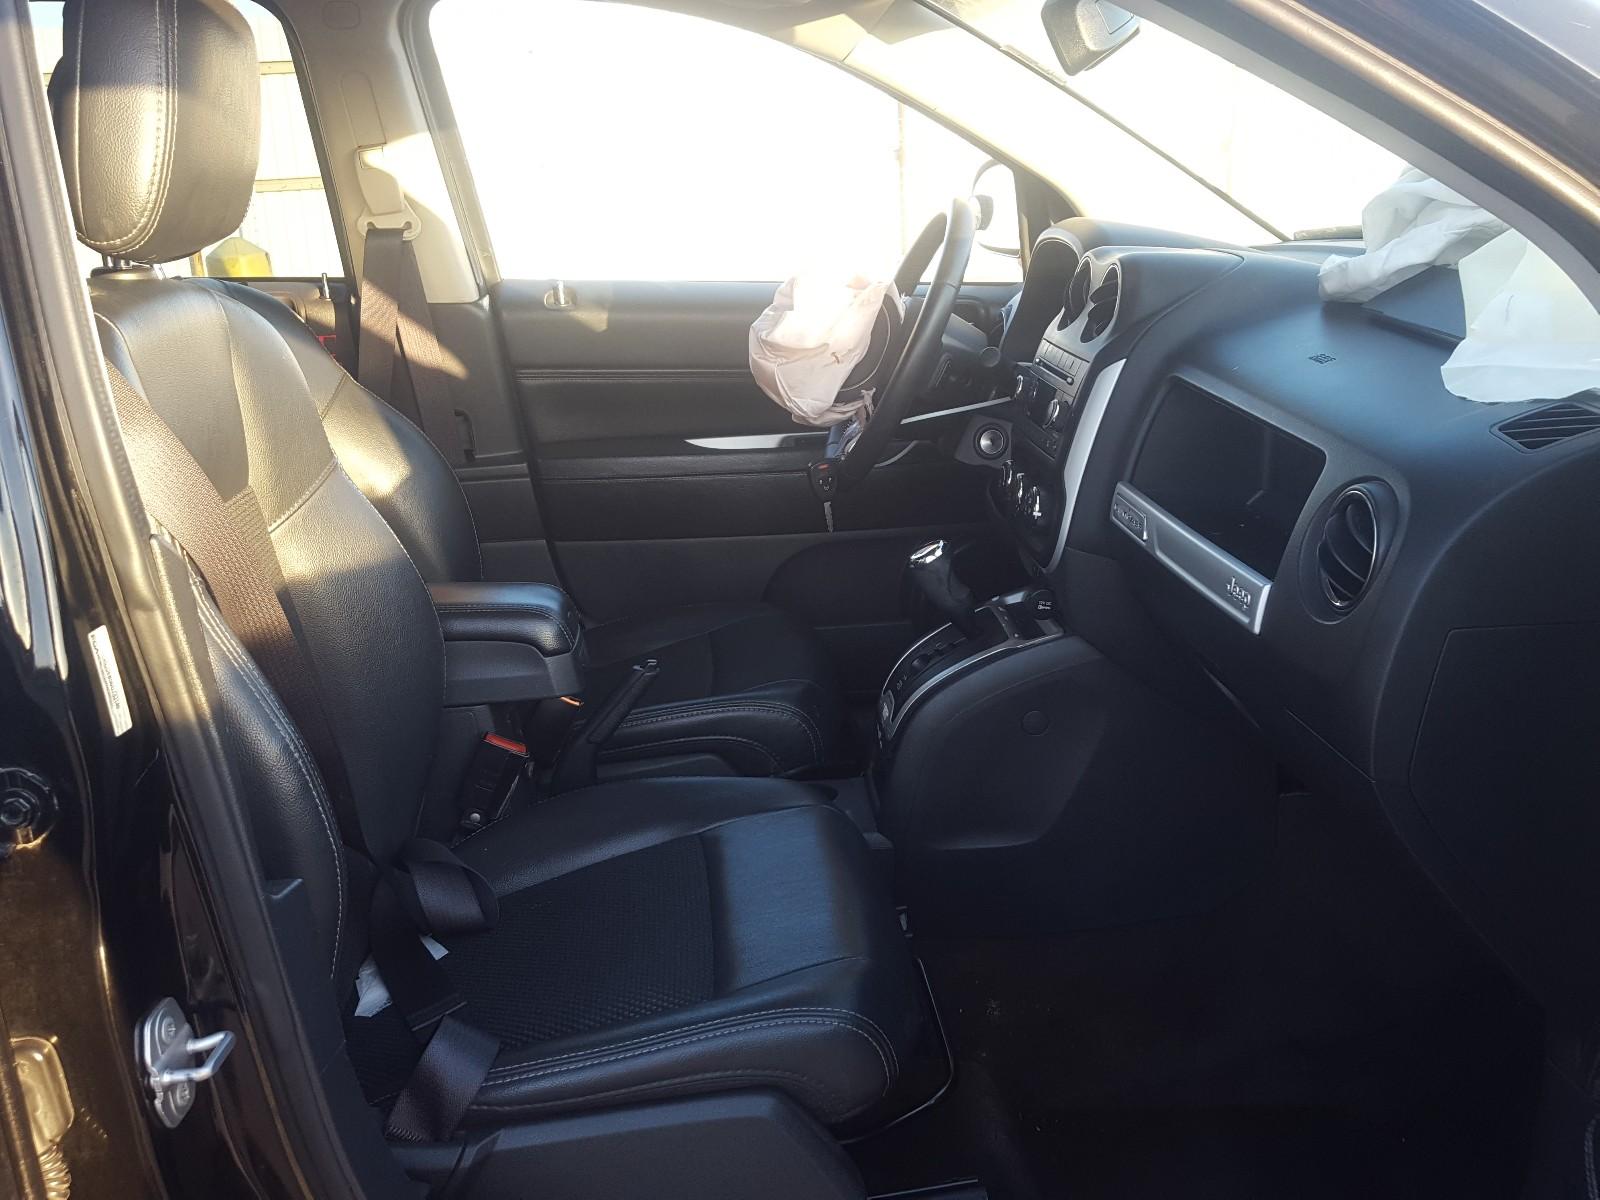 1C4NJDEB5GD733149 - 2016 Jeep Compass La 2.4L close up View